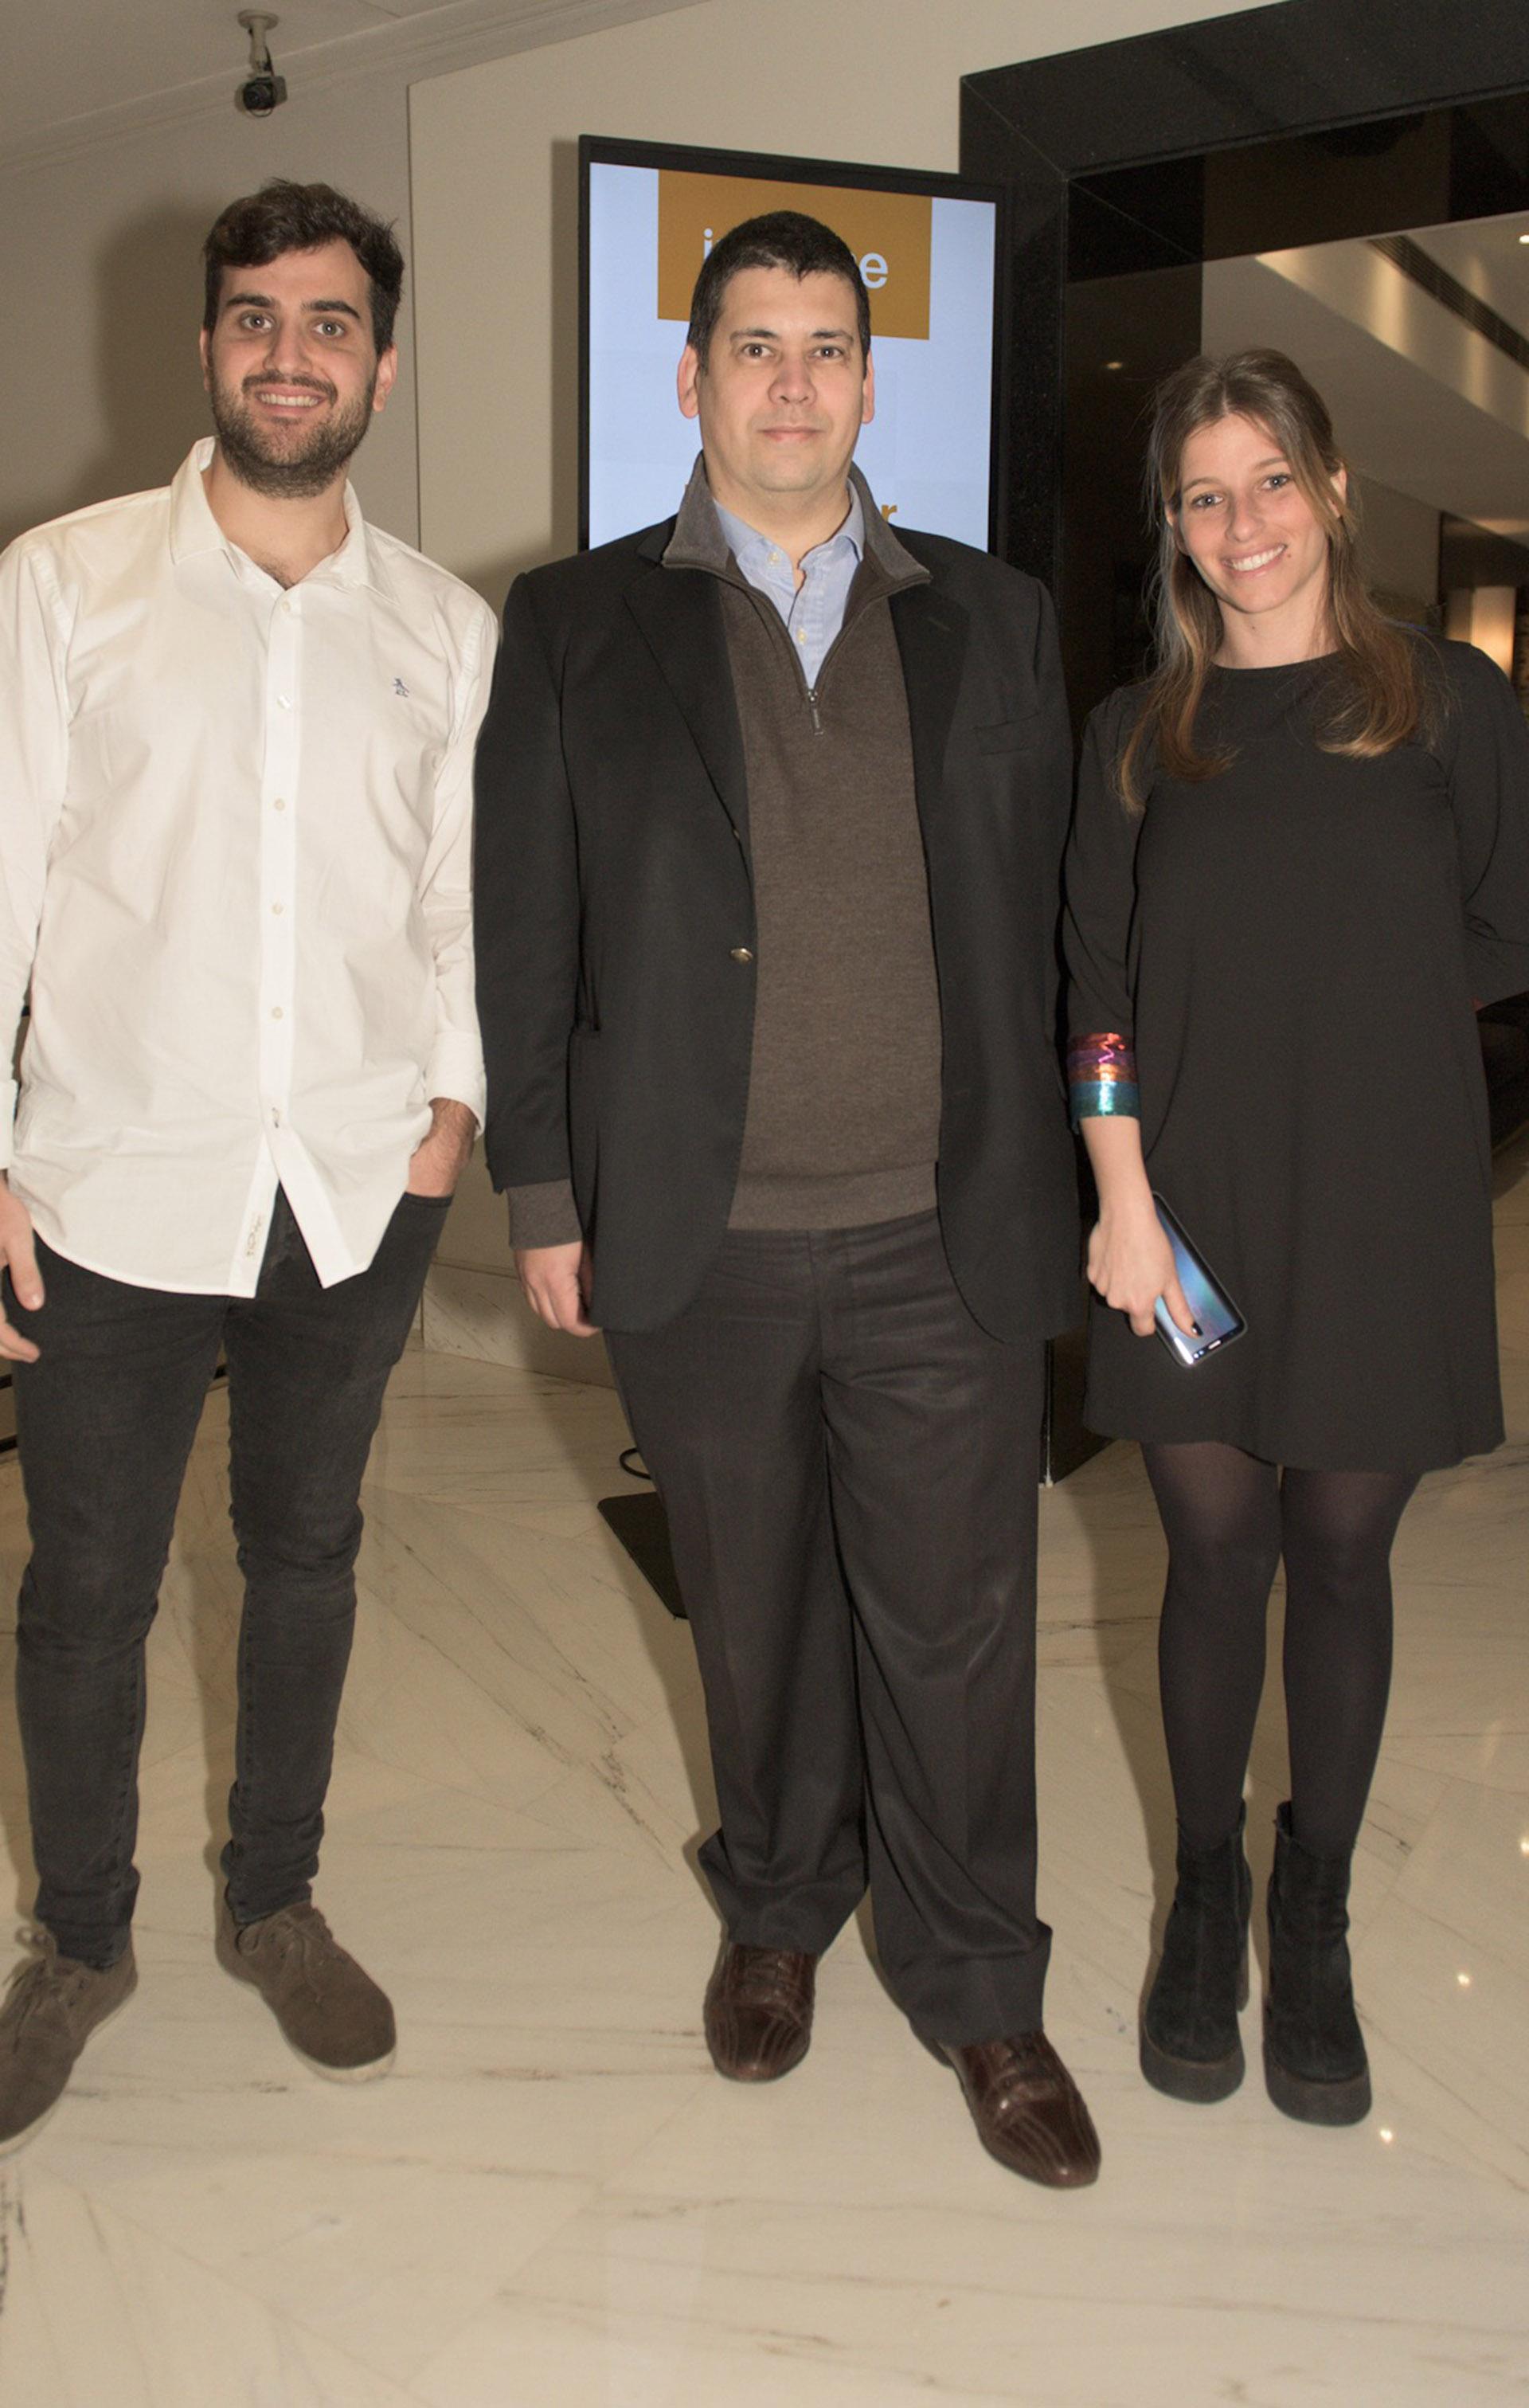 Emiliano Moretti y Priscila Pipman de Infobae junto a Javier Albornoz de Laboratorios Lepetit